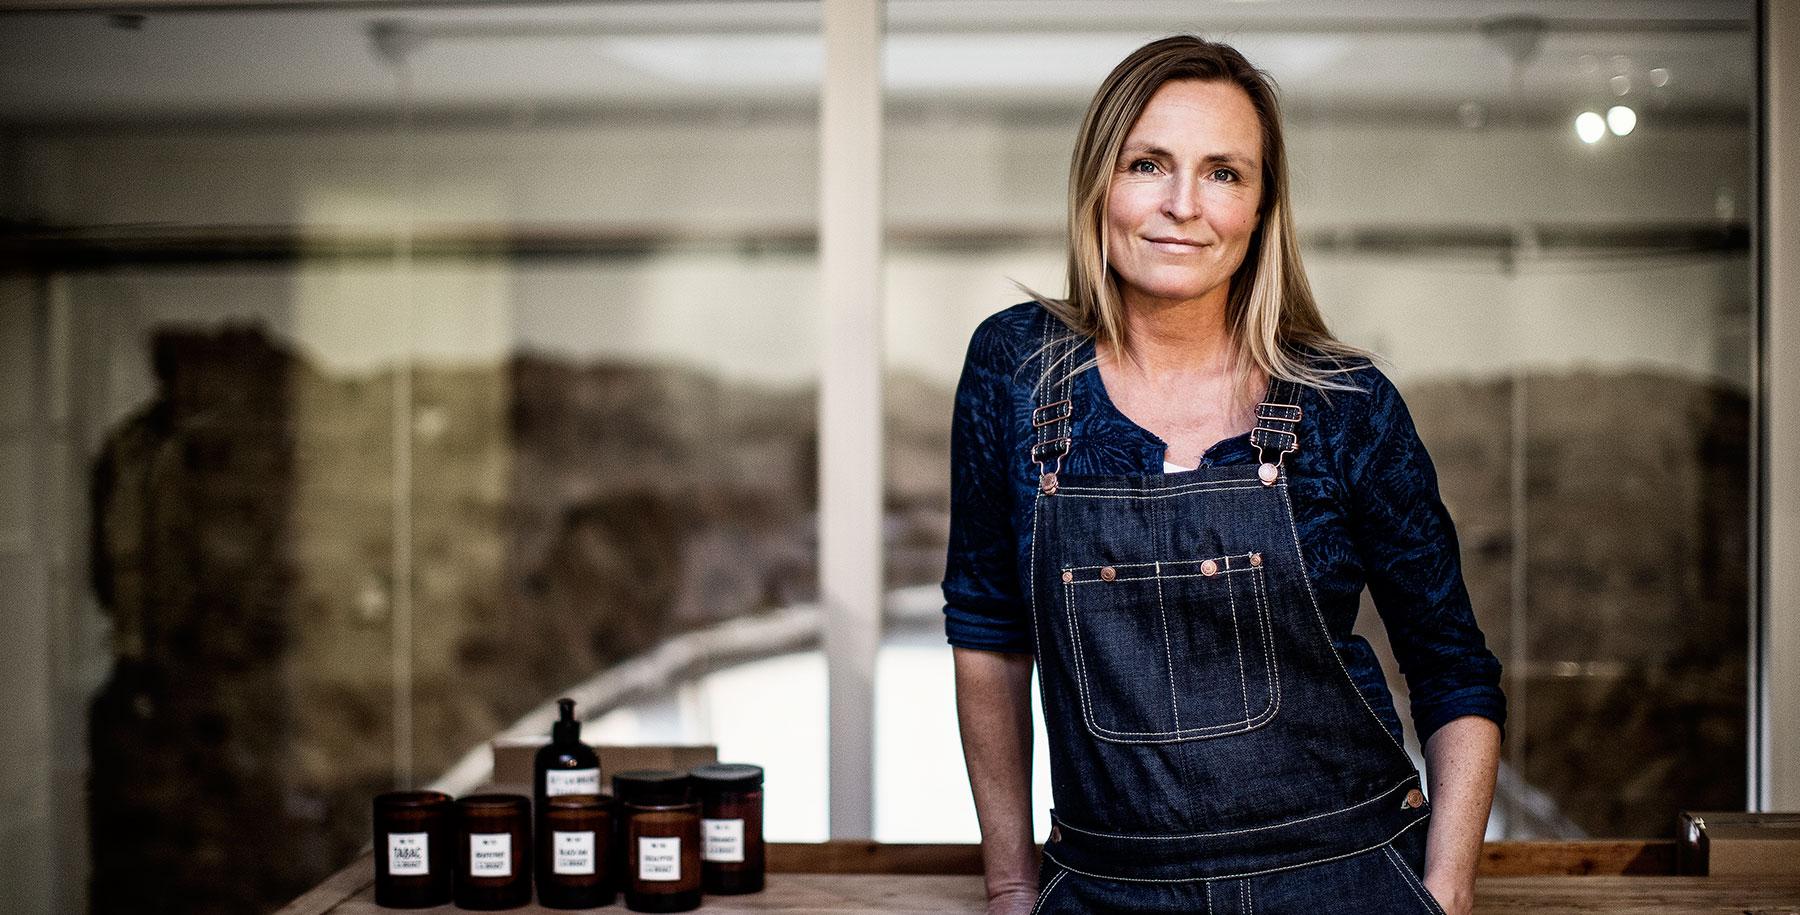 Monica Kylen Creadora de L.A Bruket, cosmética sueca natural, artesana y unisex